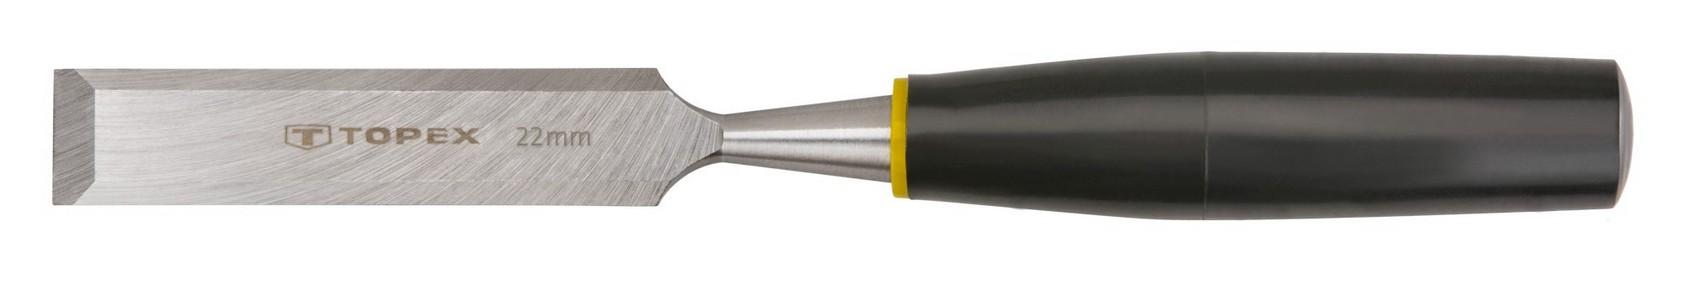 Favésõ 22 mm lapos, mûanyag nyelû | TOPEX 09A122